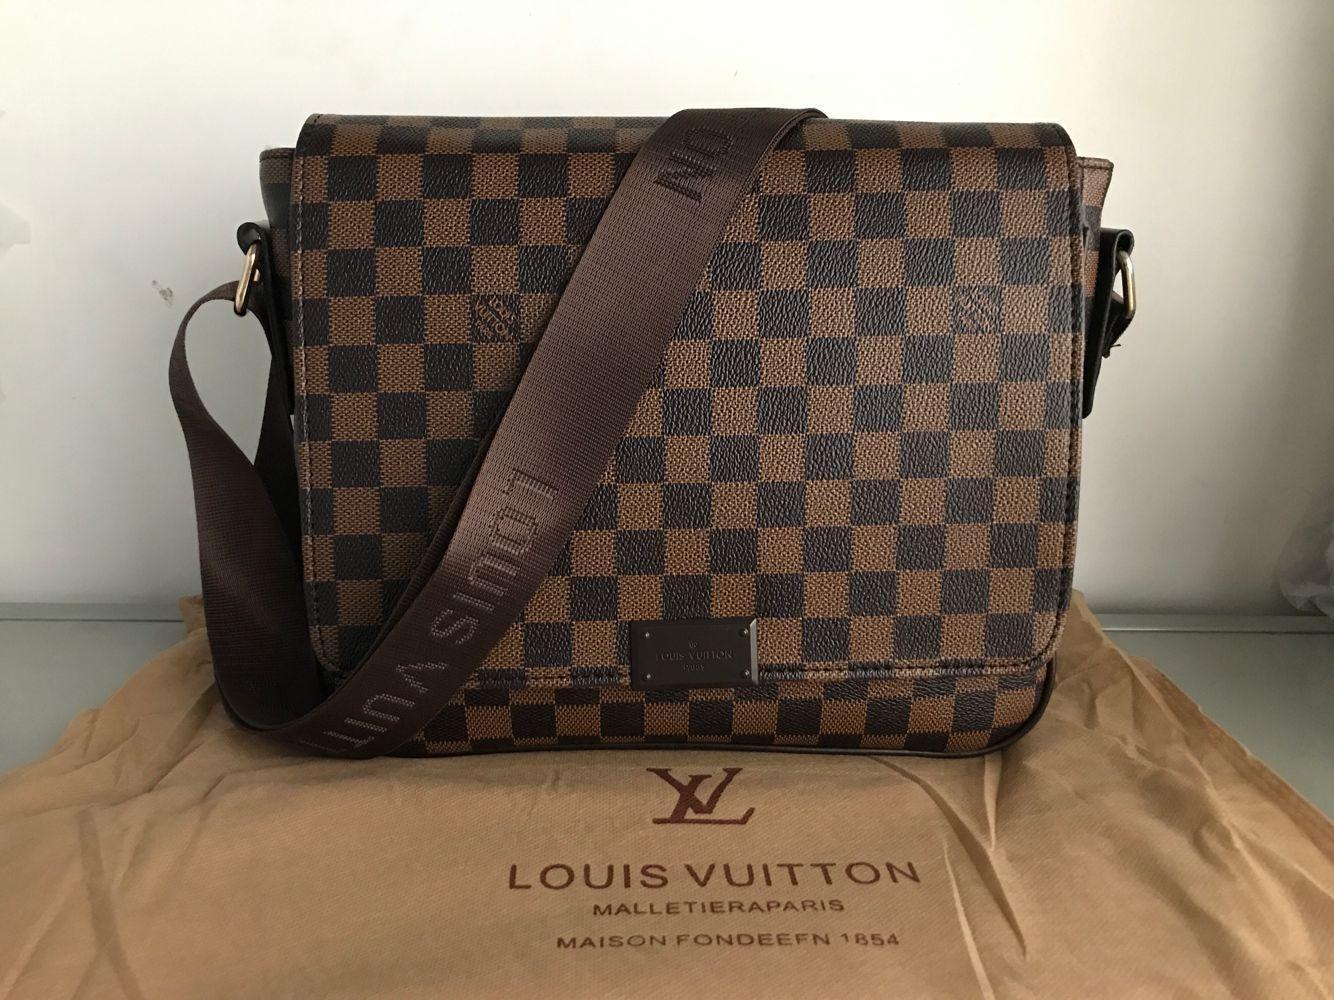 Borsa Borsello Uomini 20 Pelle Casual Business Mens Messenger Bag Uomo Vintage Bolsas maschio